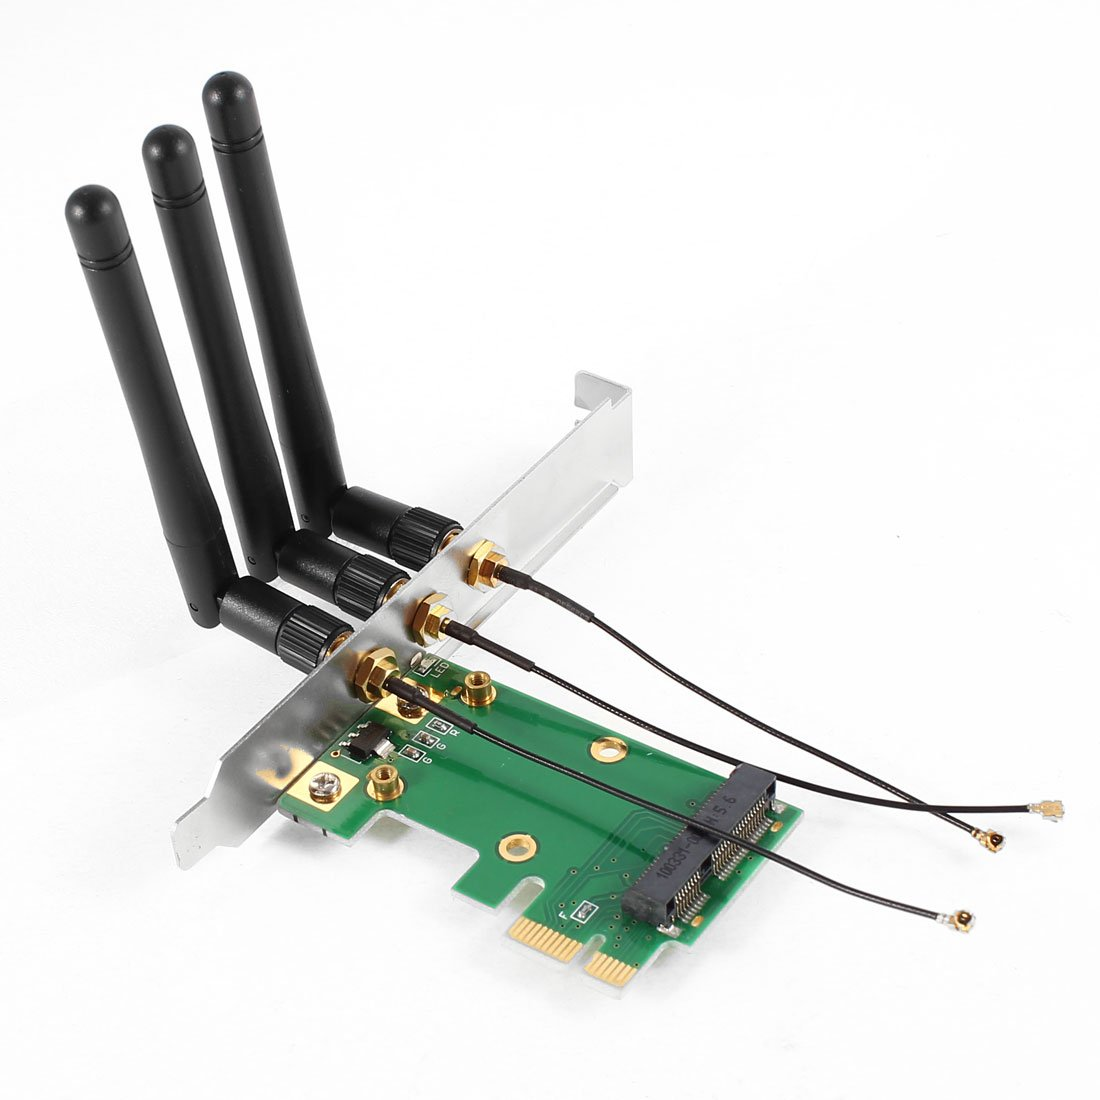 GTFS Hot Mini PCI-E Express to PCI-E Wireless Adapter w 3 Antenna WiFi for PC стоимость